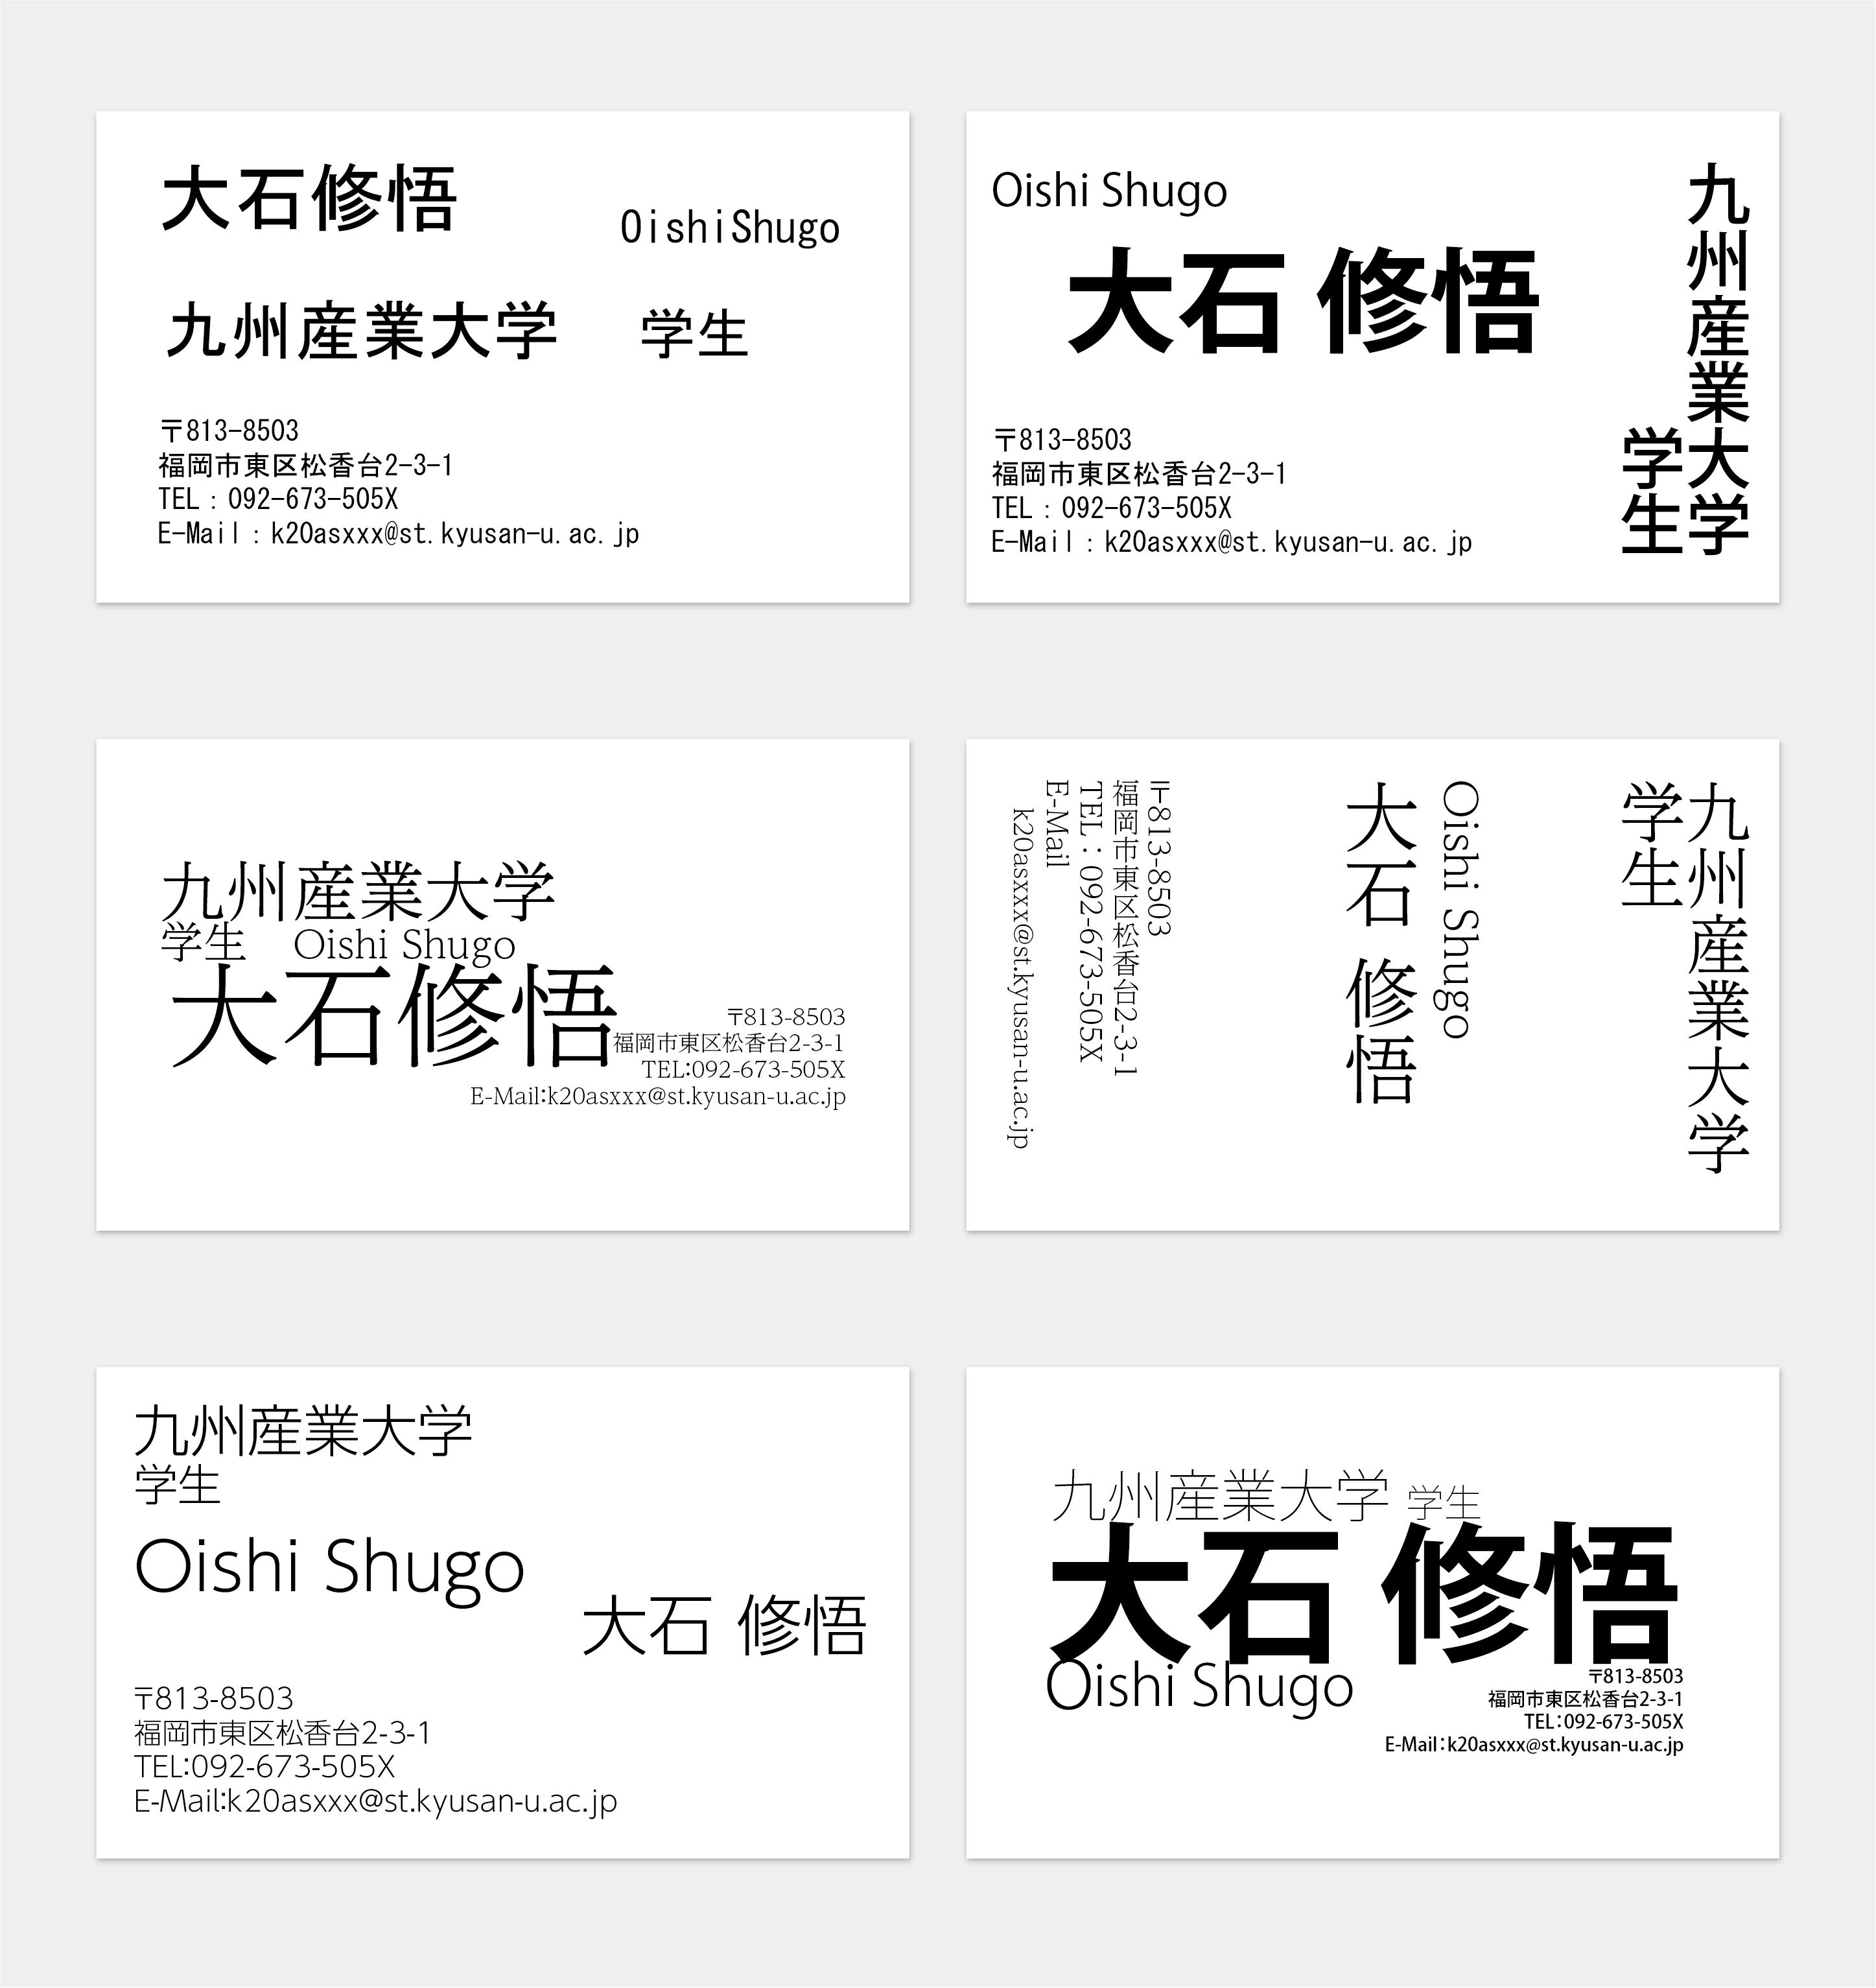 Oishi2021.04.16 .png